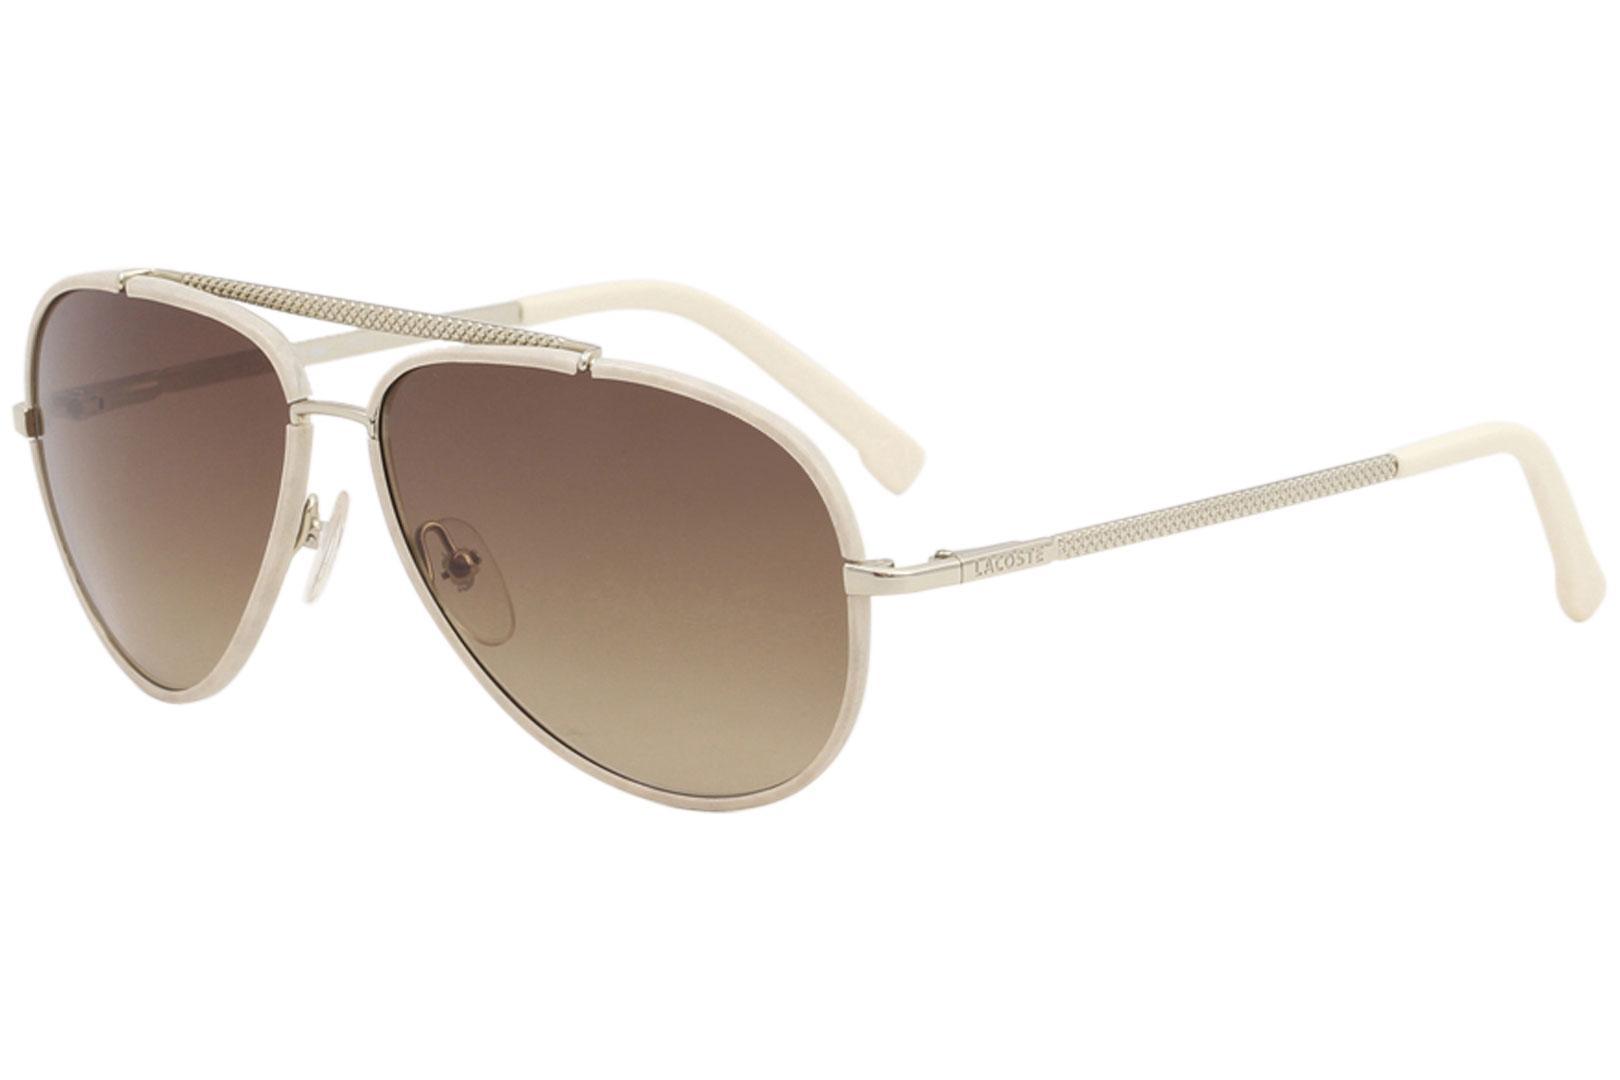 6ae2970184c Lacoste Women s L152S L 152 S Fashion Pilot Sunglasses